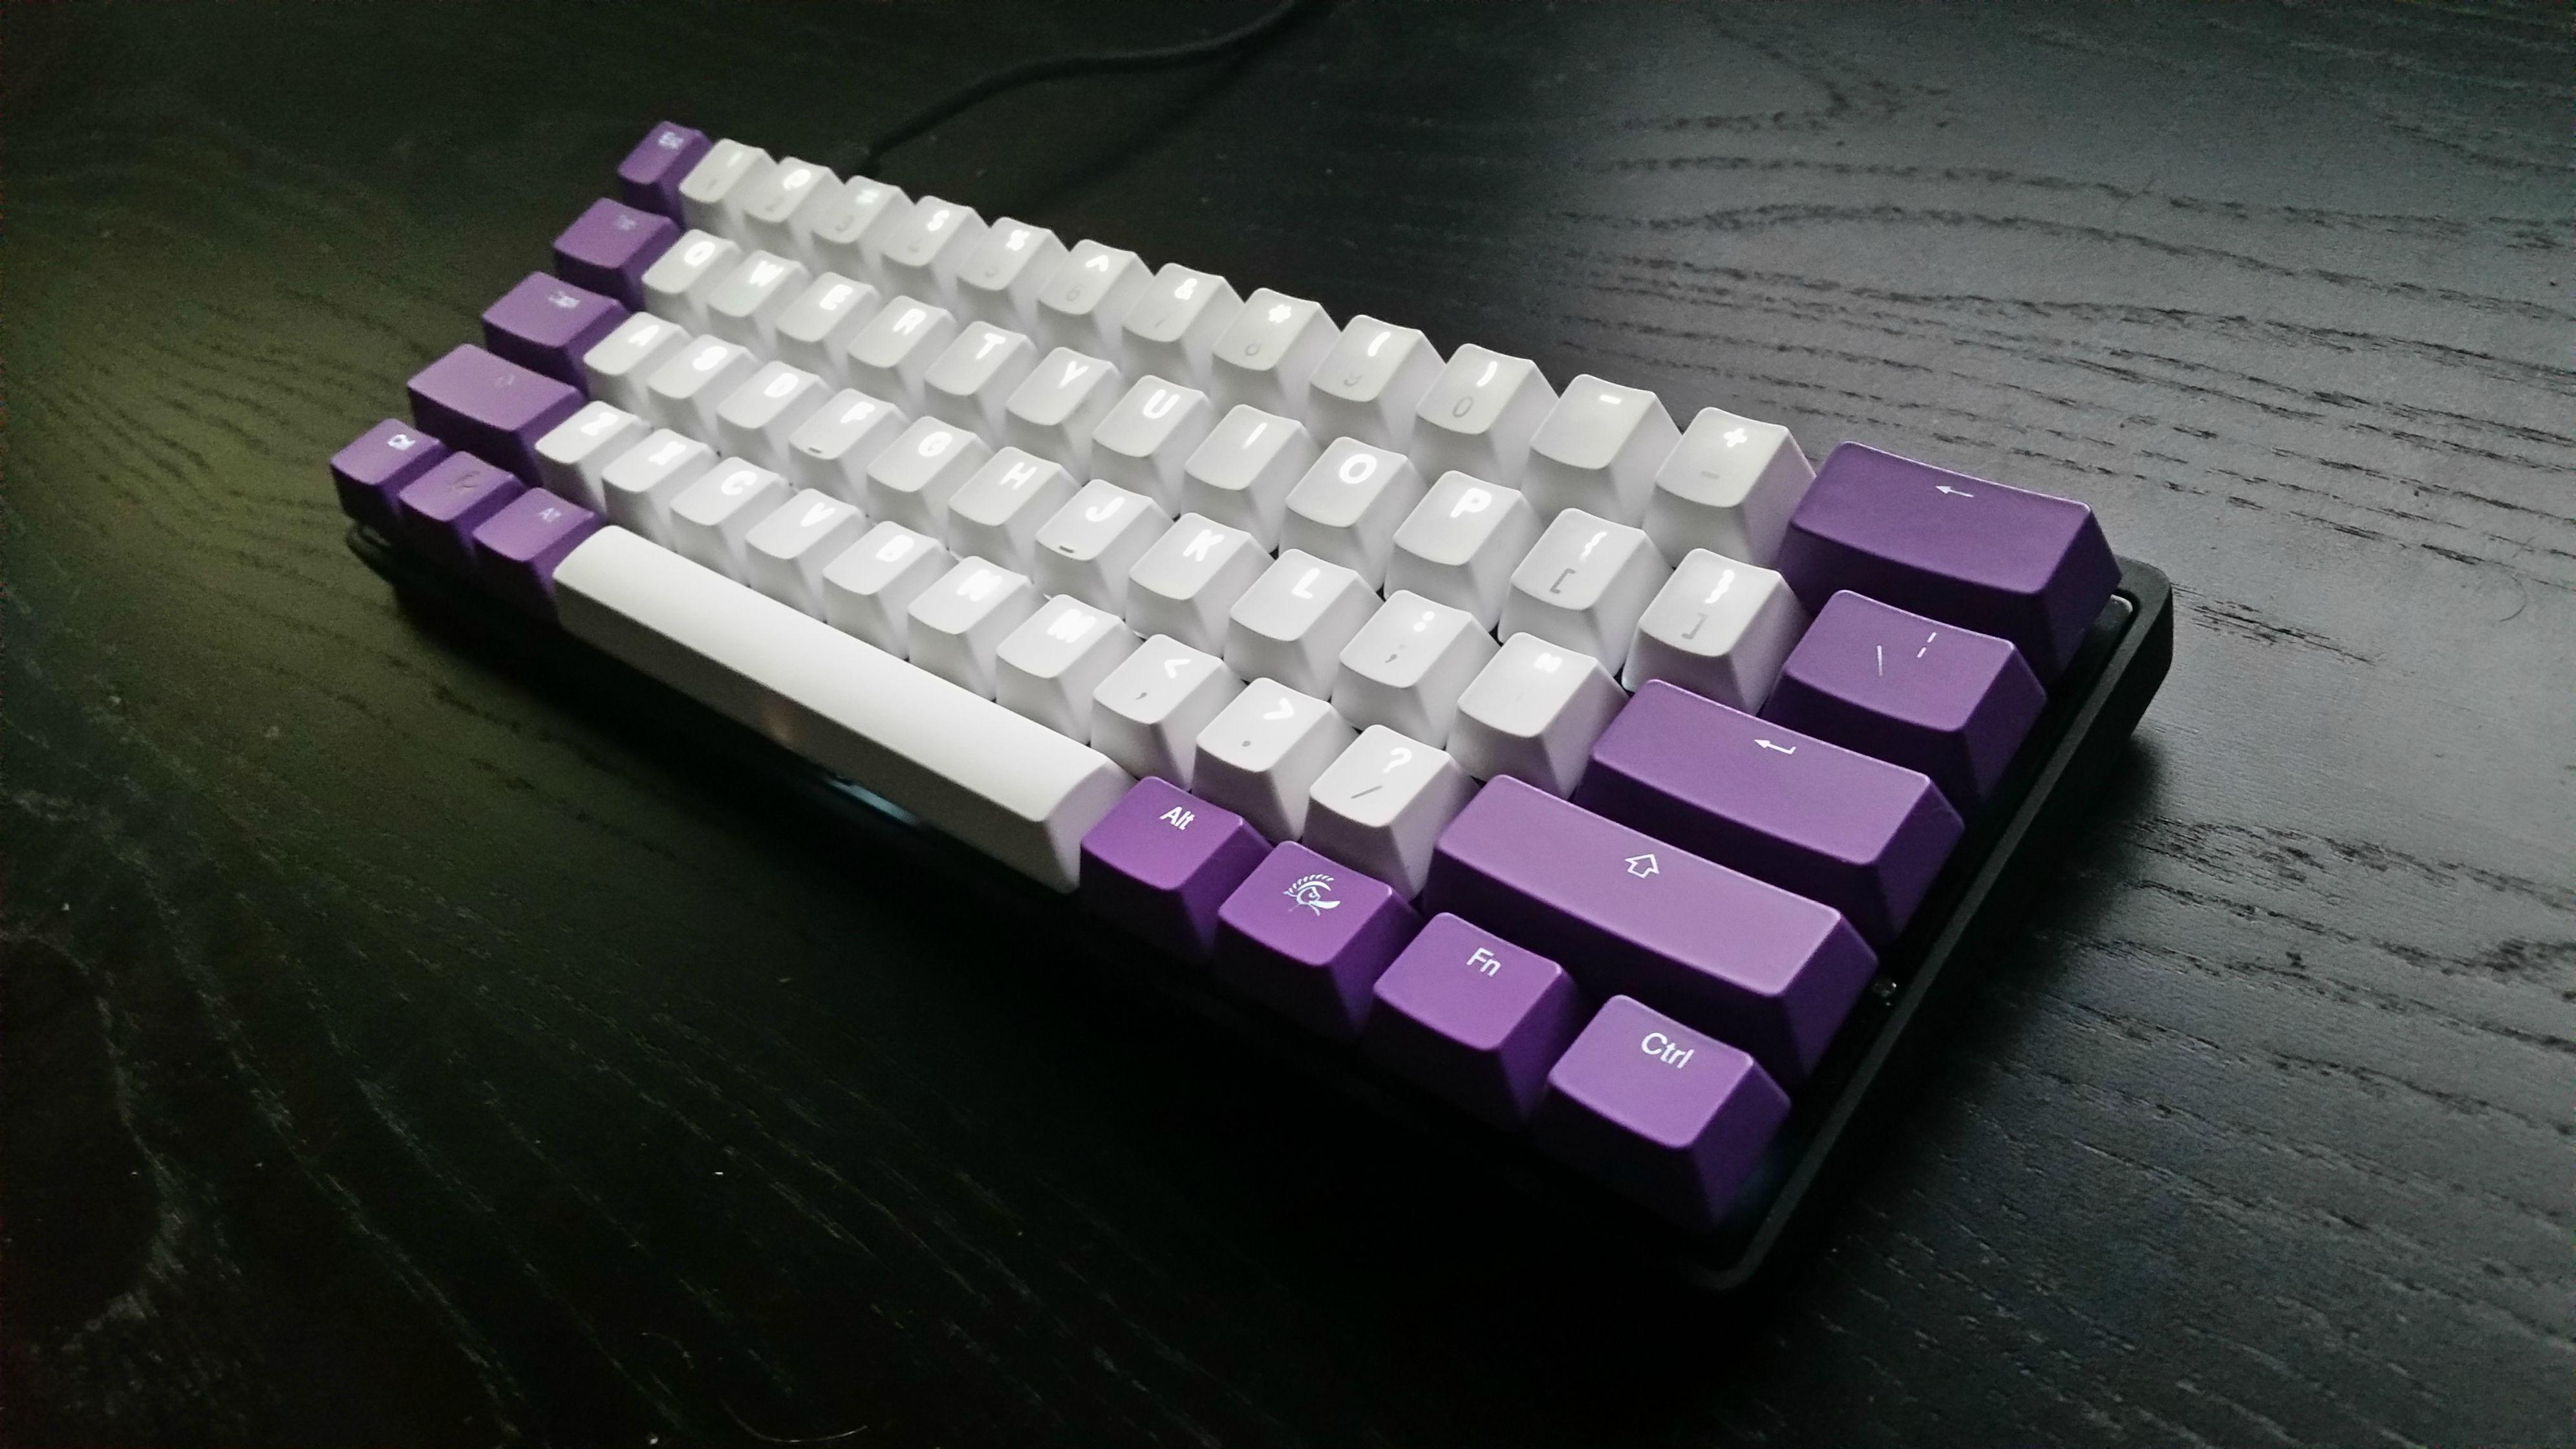 Ducky purple backlit and probably Vortex/KBT PBT+POM on